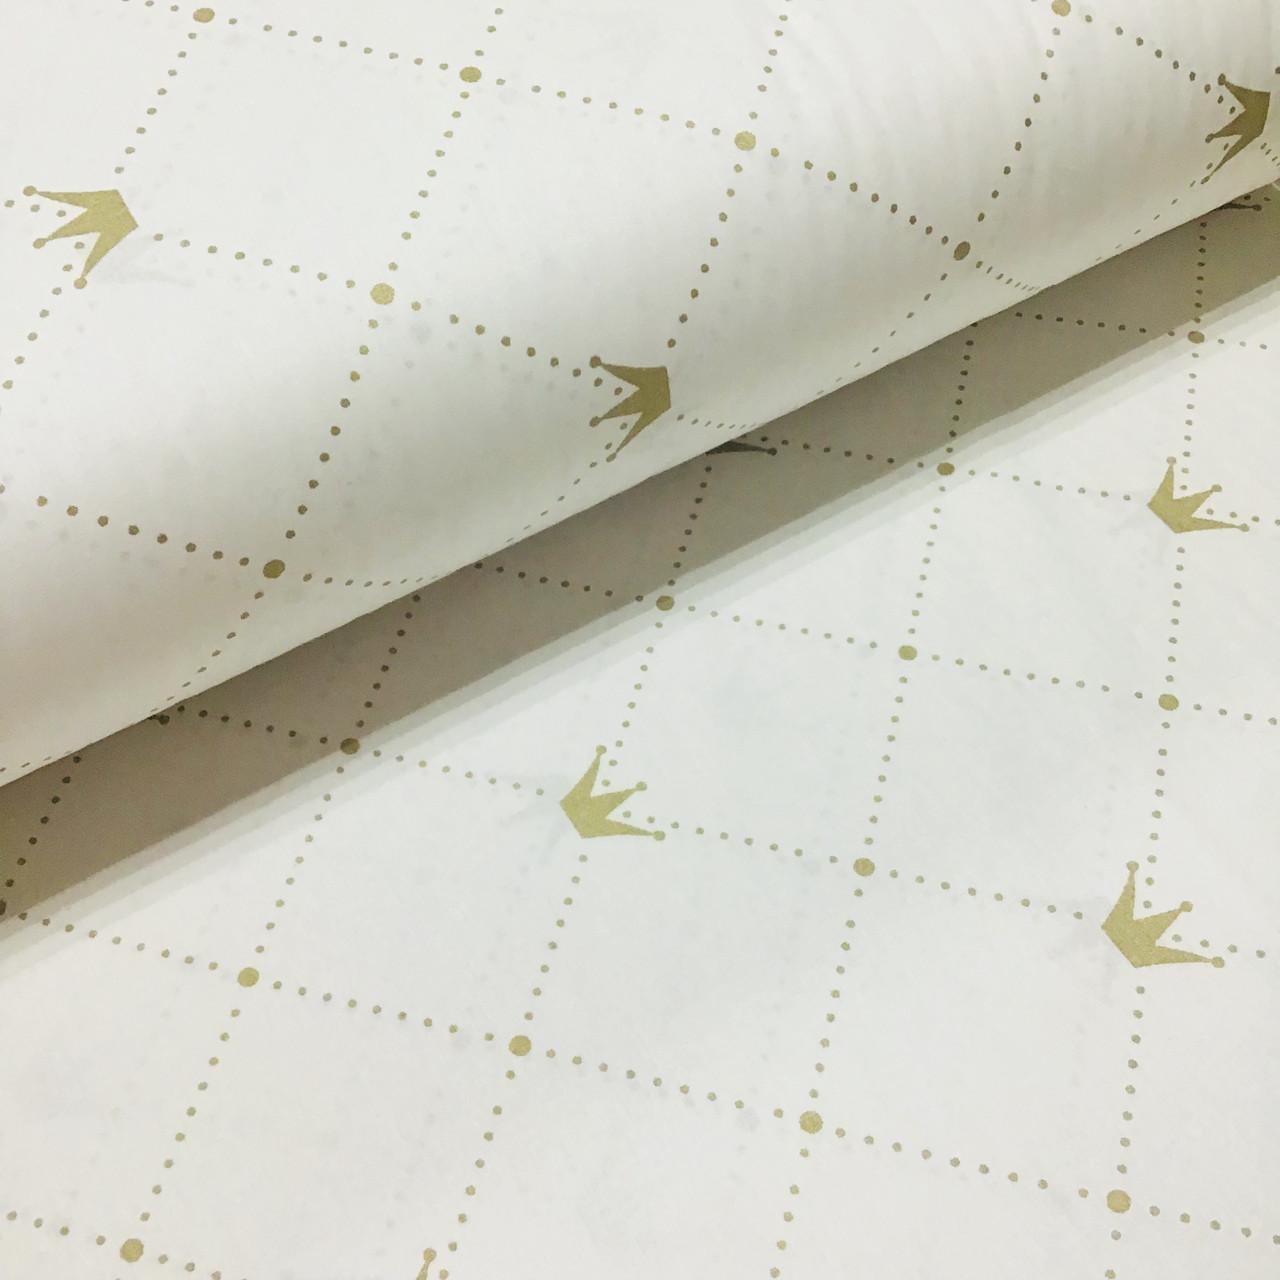 Ткань поплин короны с точечками золотые (глиттер) на белом (ТУРЦИЯ шир. 2,4 м) №33-156